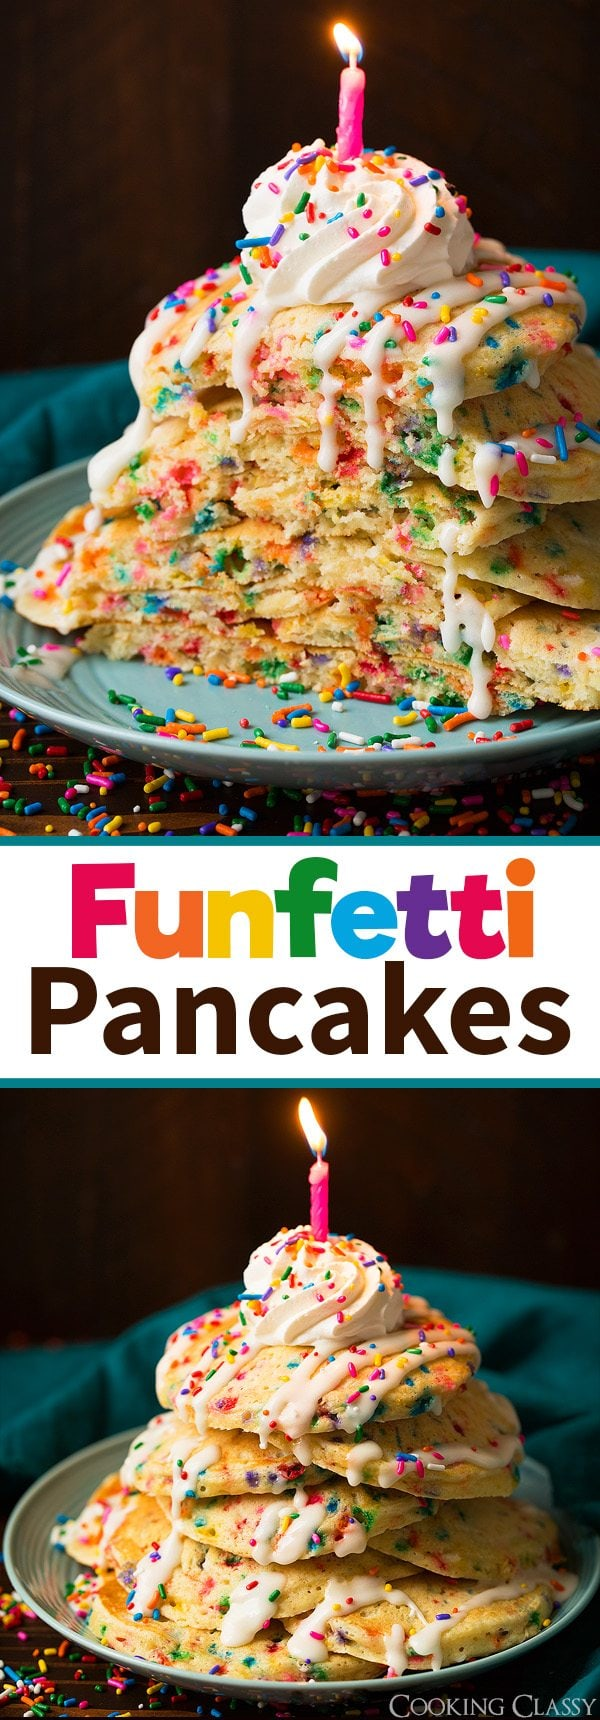 Funfetti Pancakes | Cooking Classy